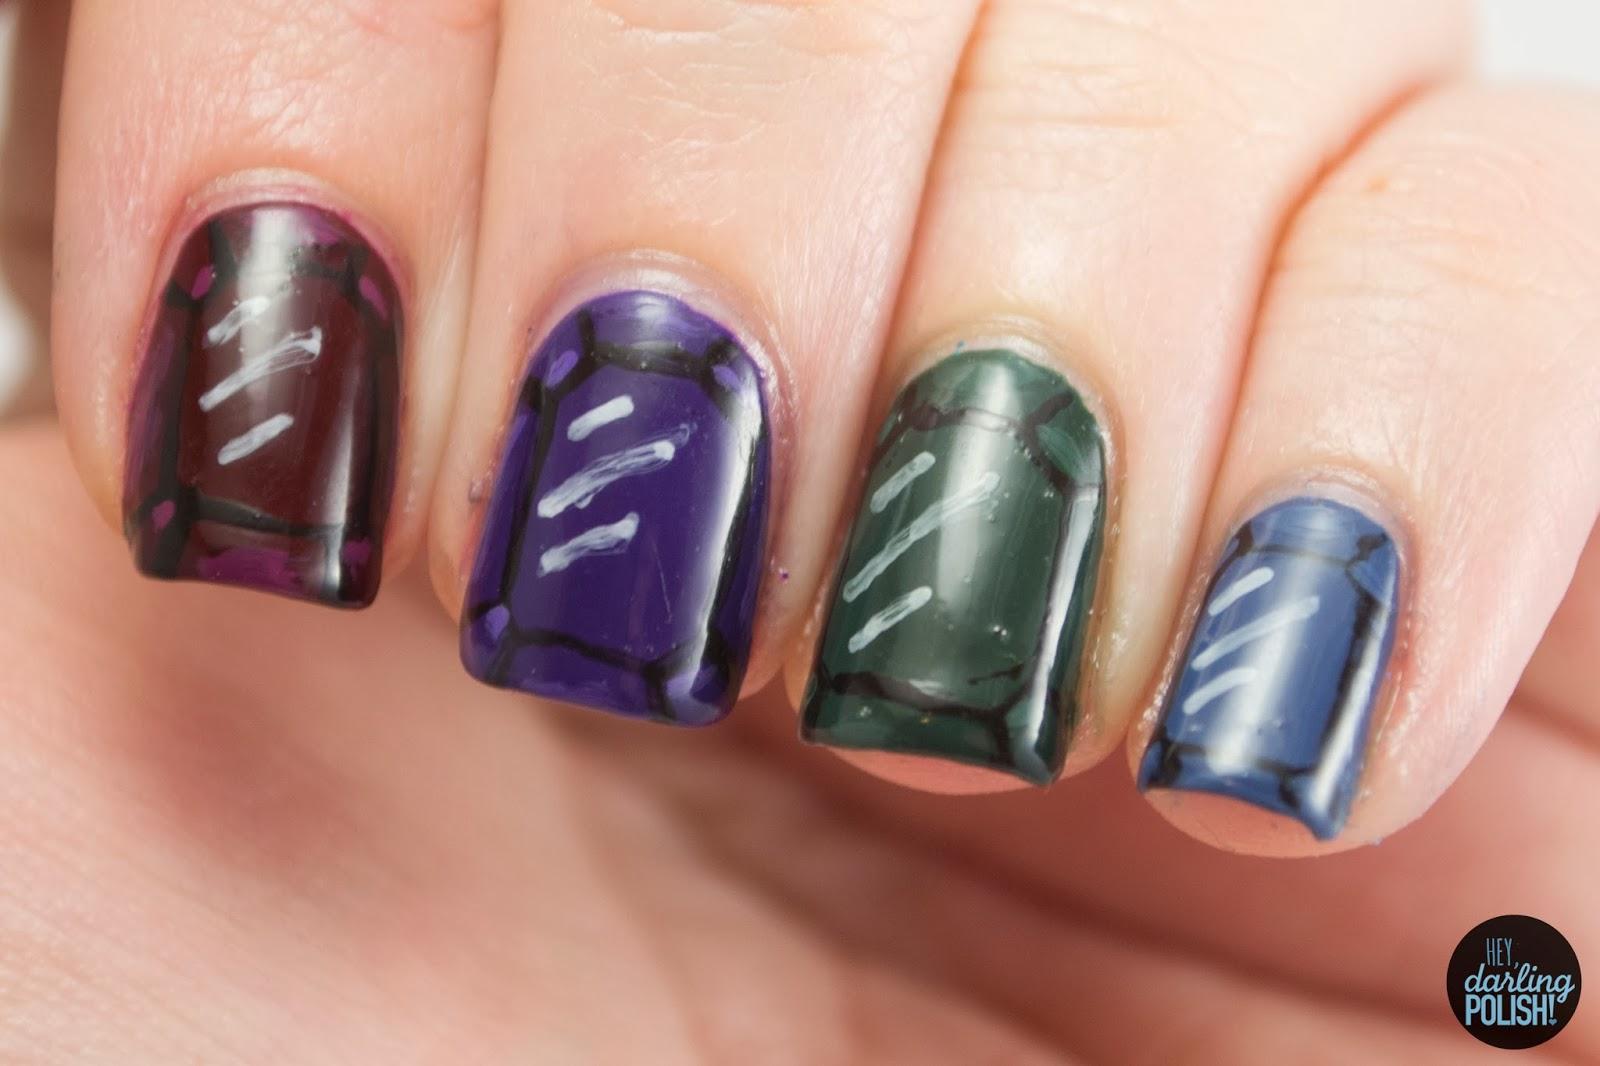 nails, nail art, polish, nail polish, jewels, gems, jewel tones, nail-art-a-go-go, challenge, hey darling polish